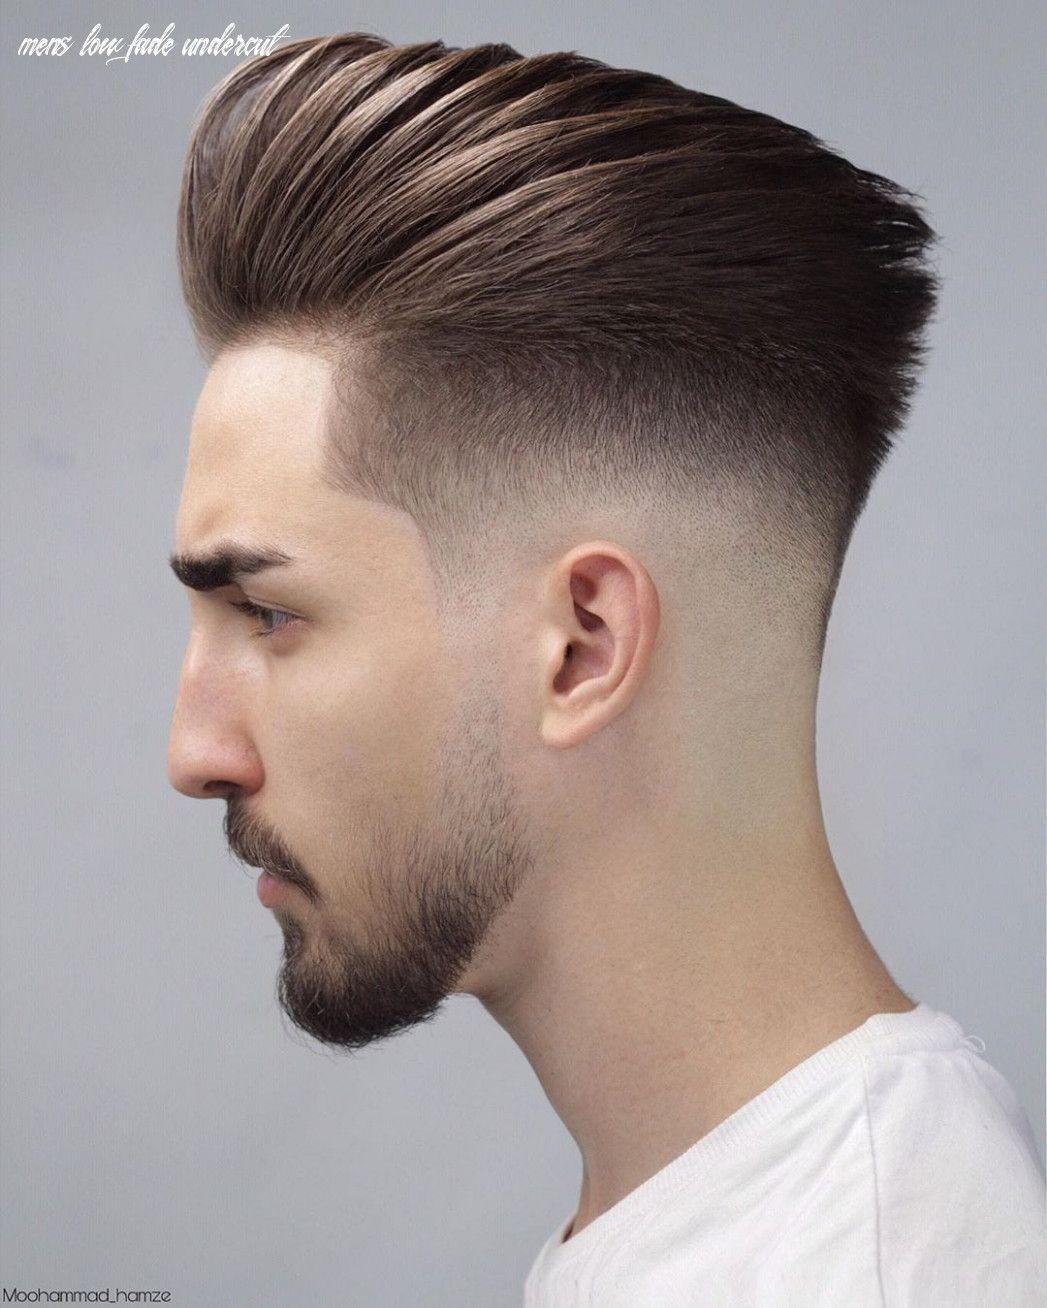 10 Mens Low Fade Undercut Gaya Rambut Pria Gaya Rambut Rambut Pria